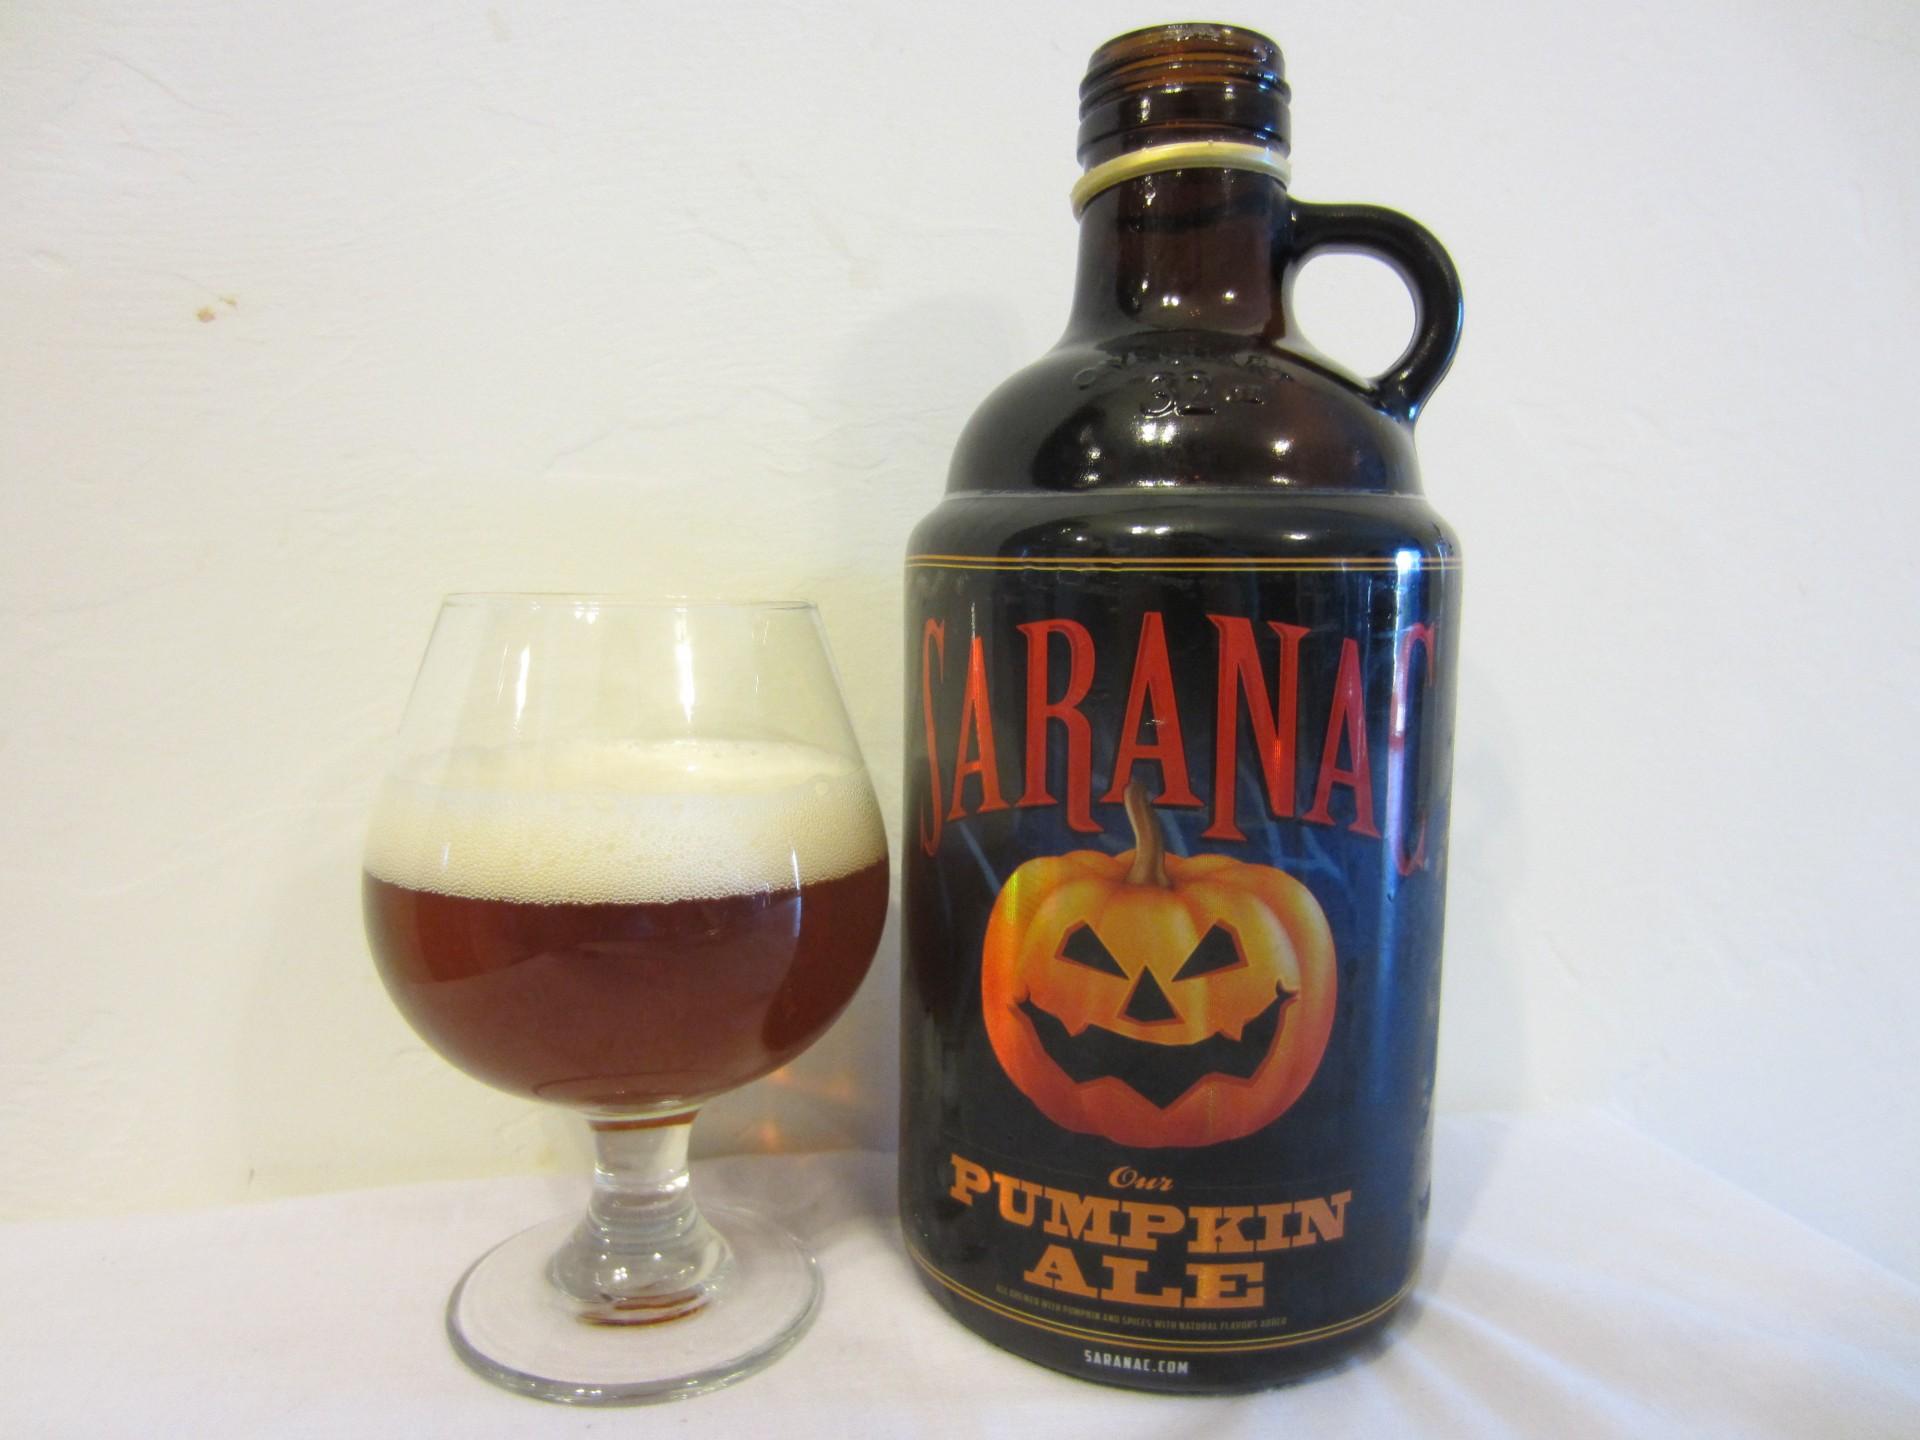 Saranac Pumpkin Ale - Matt Brewing Company / Saranac Brewery